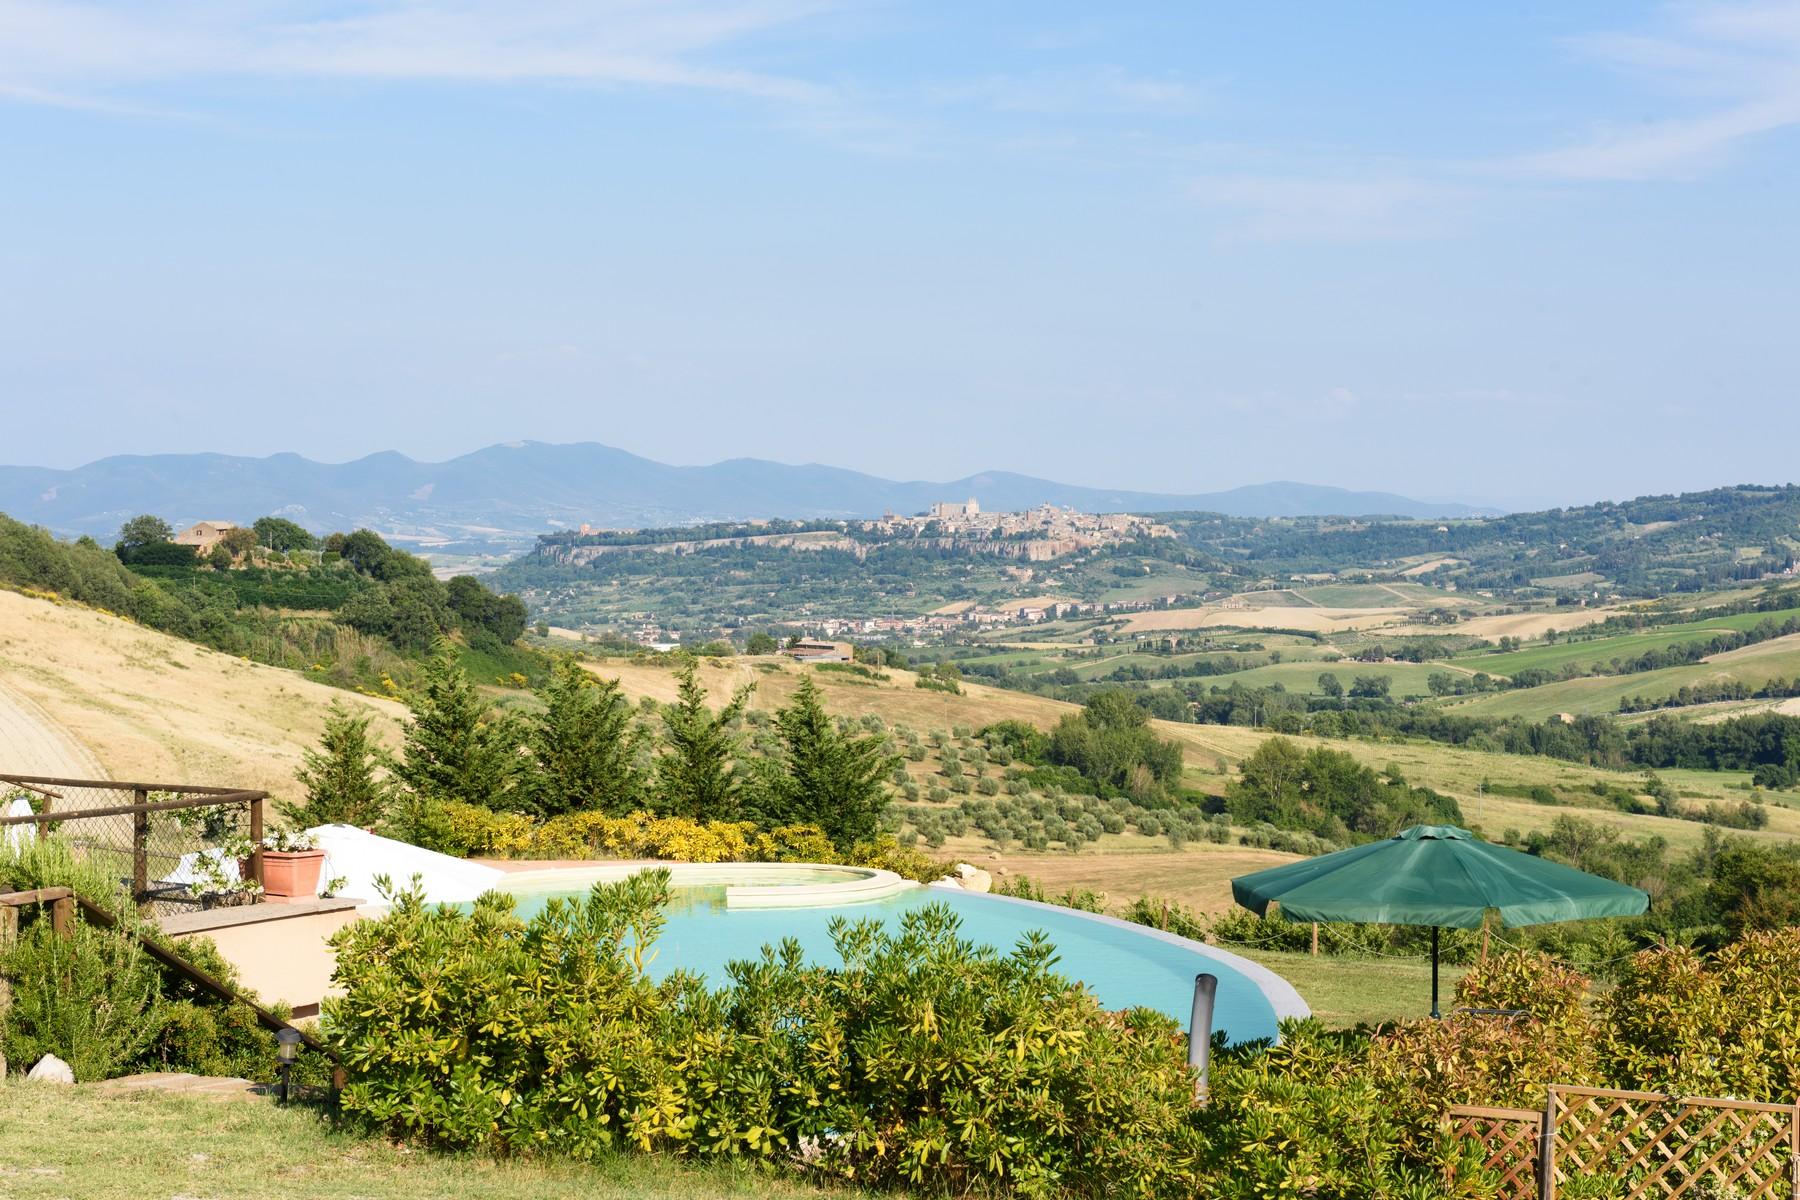 Casa indipendente in Vendita a Castel Viscardo: 5 locali, 700 mq - Foto 3